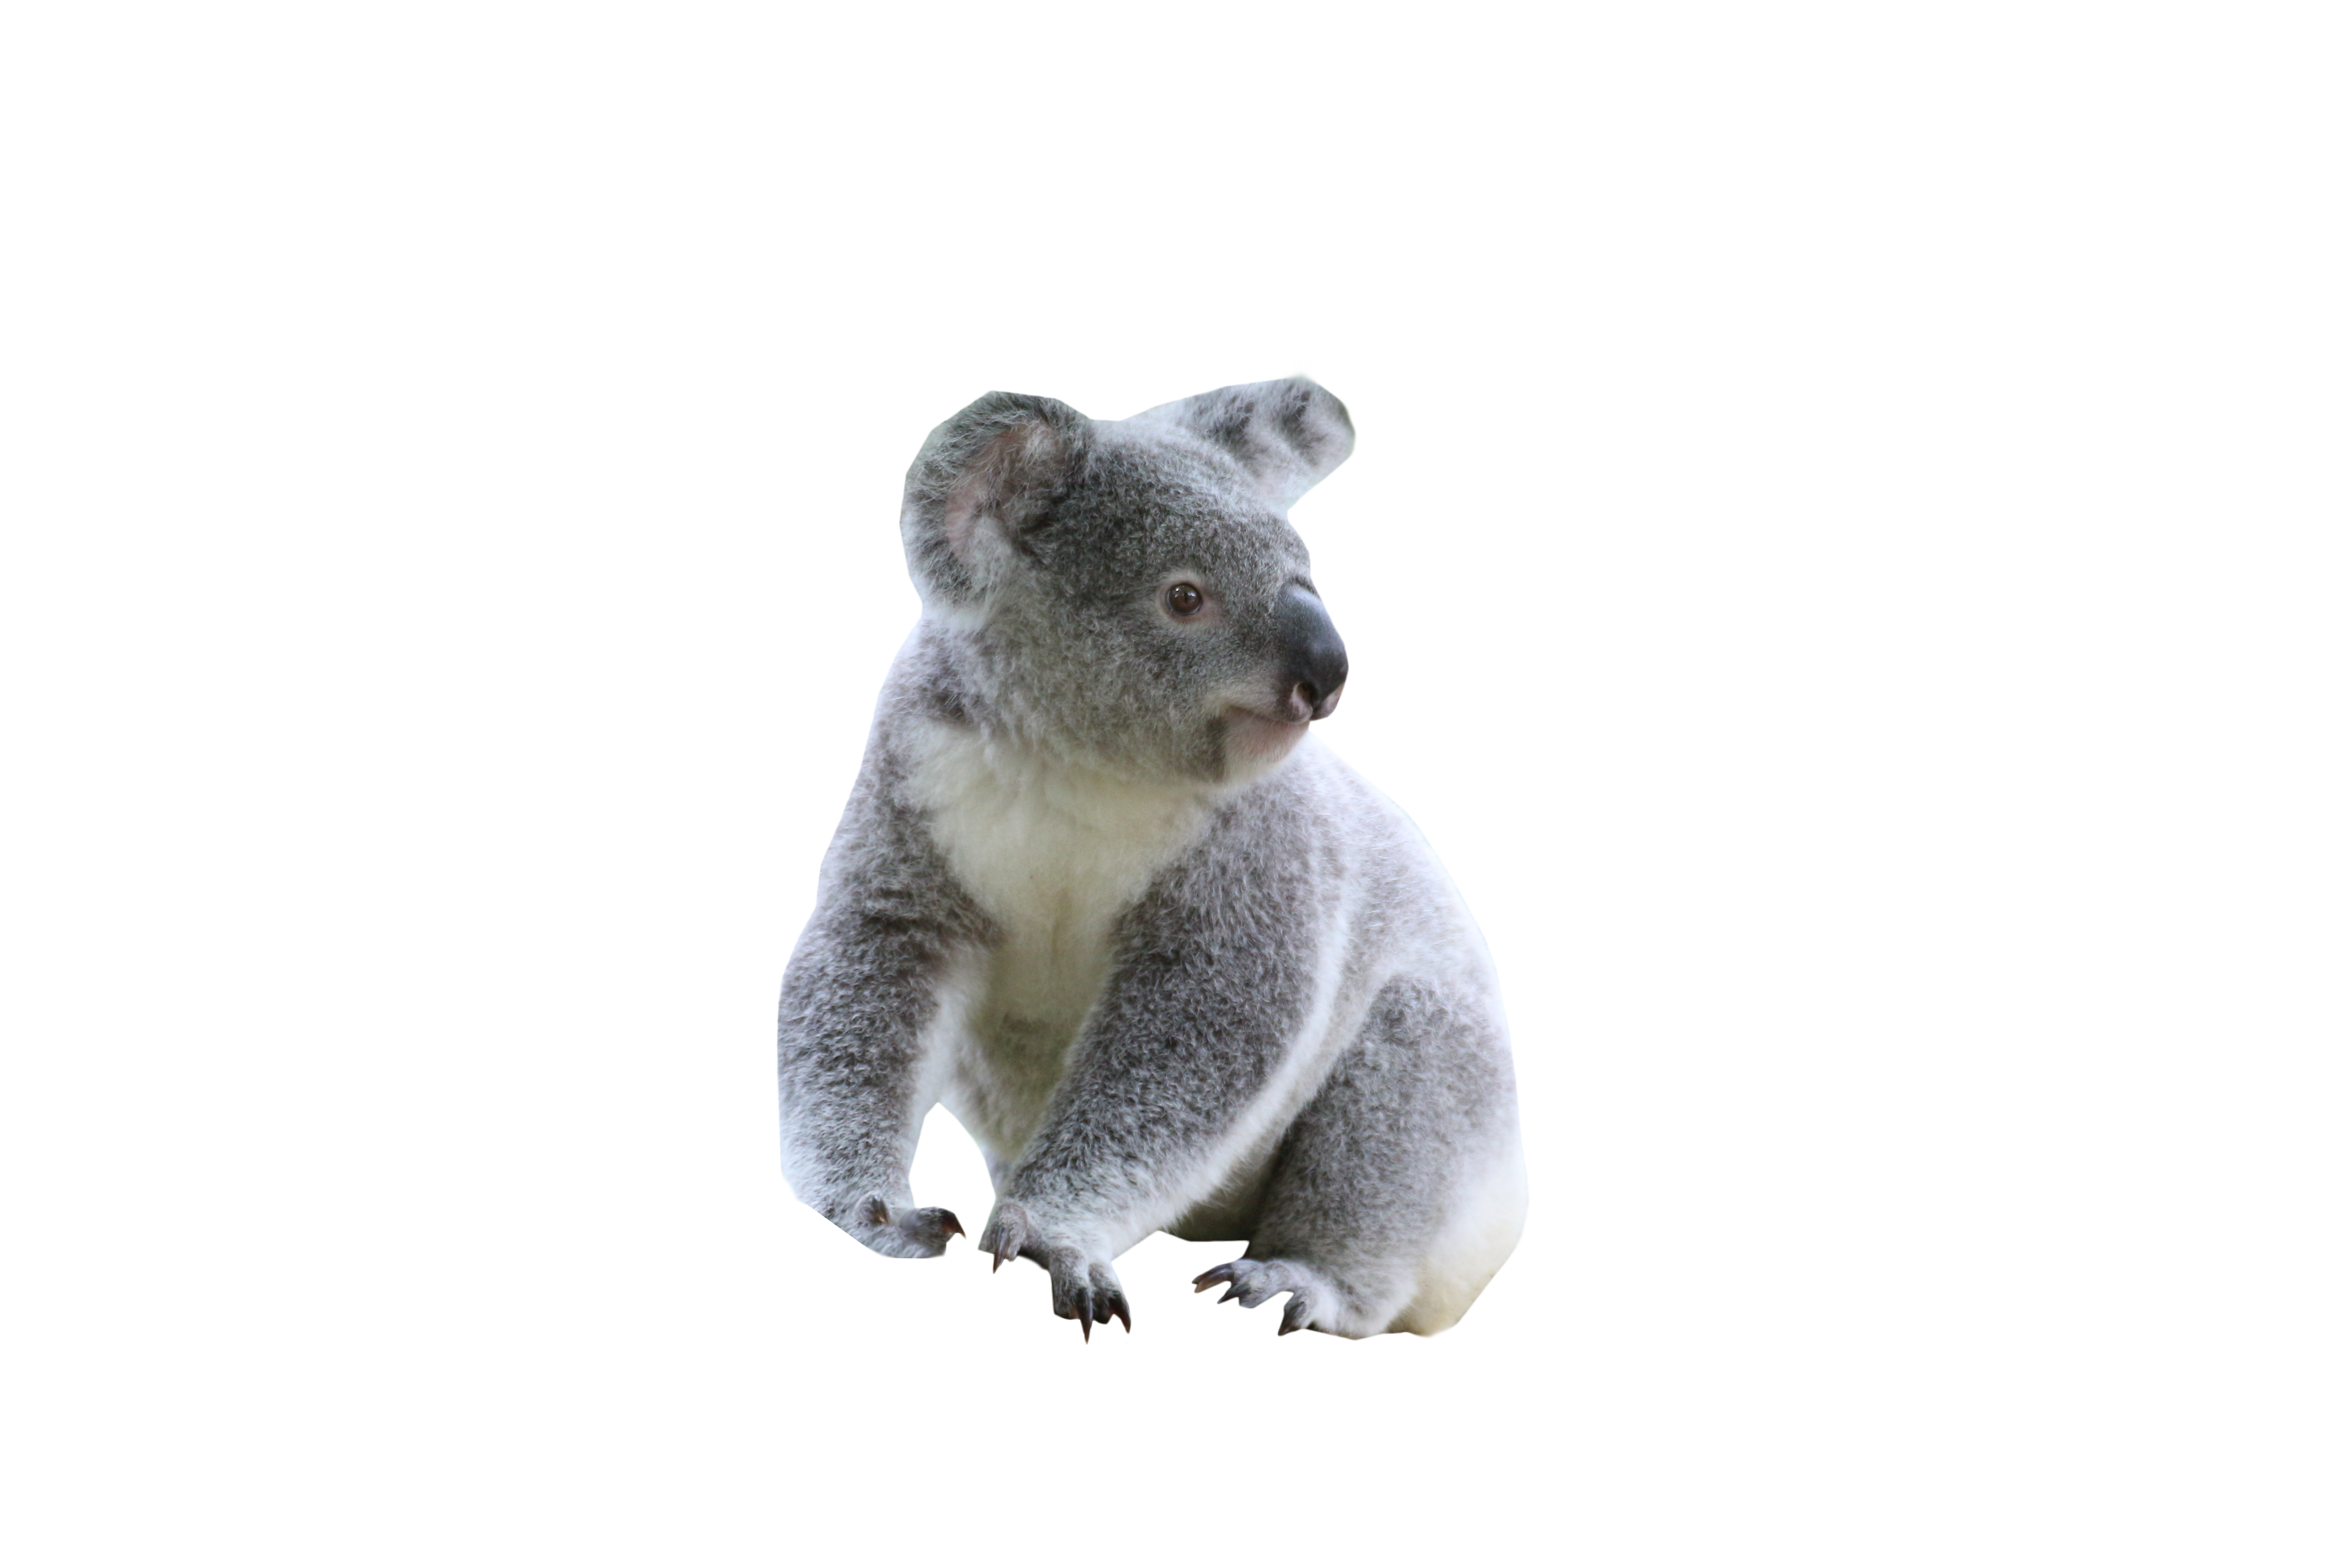 Download Cute Koala PNG Image for Free